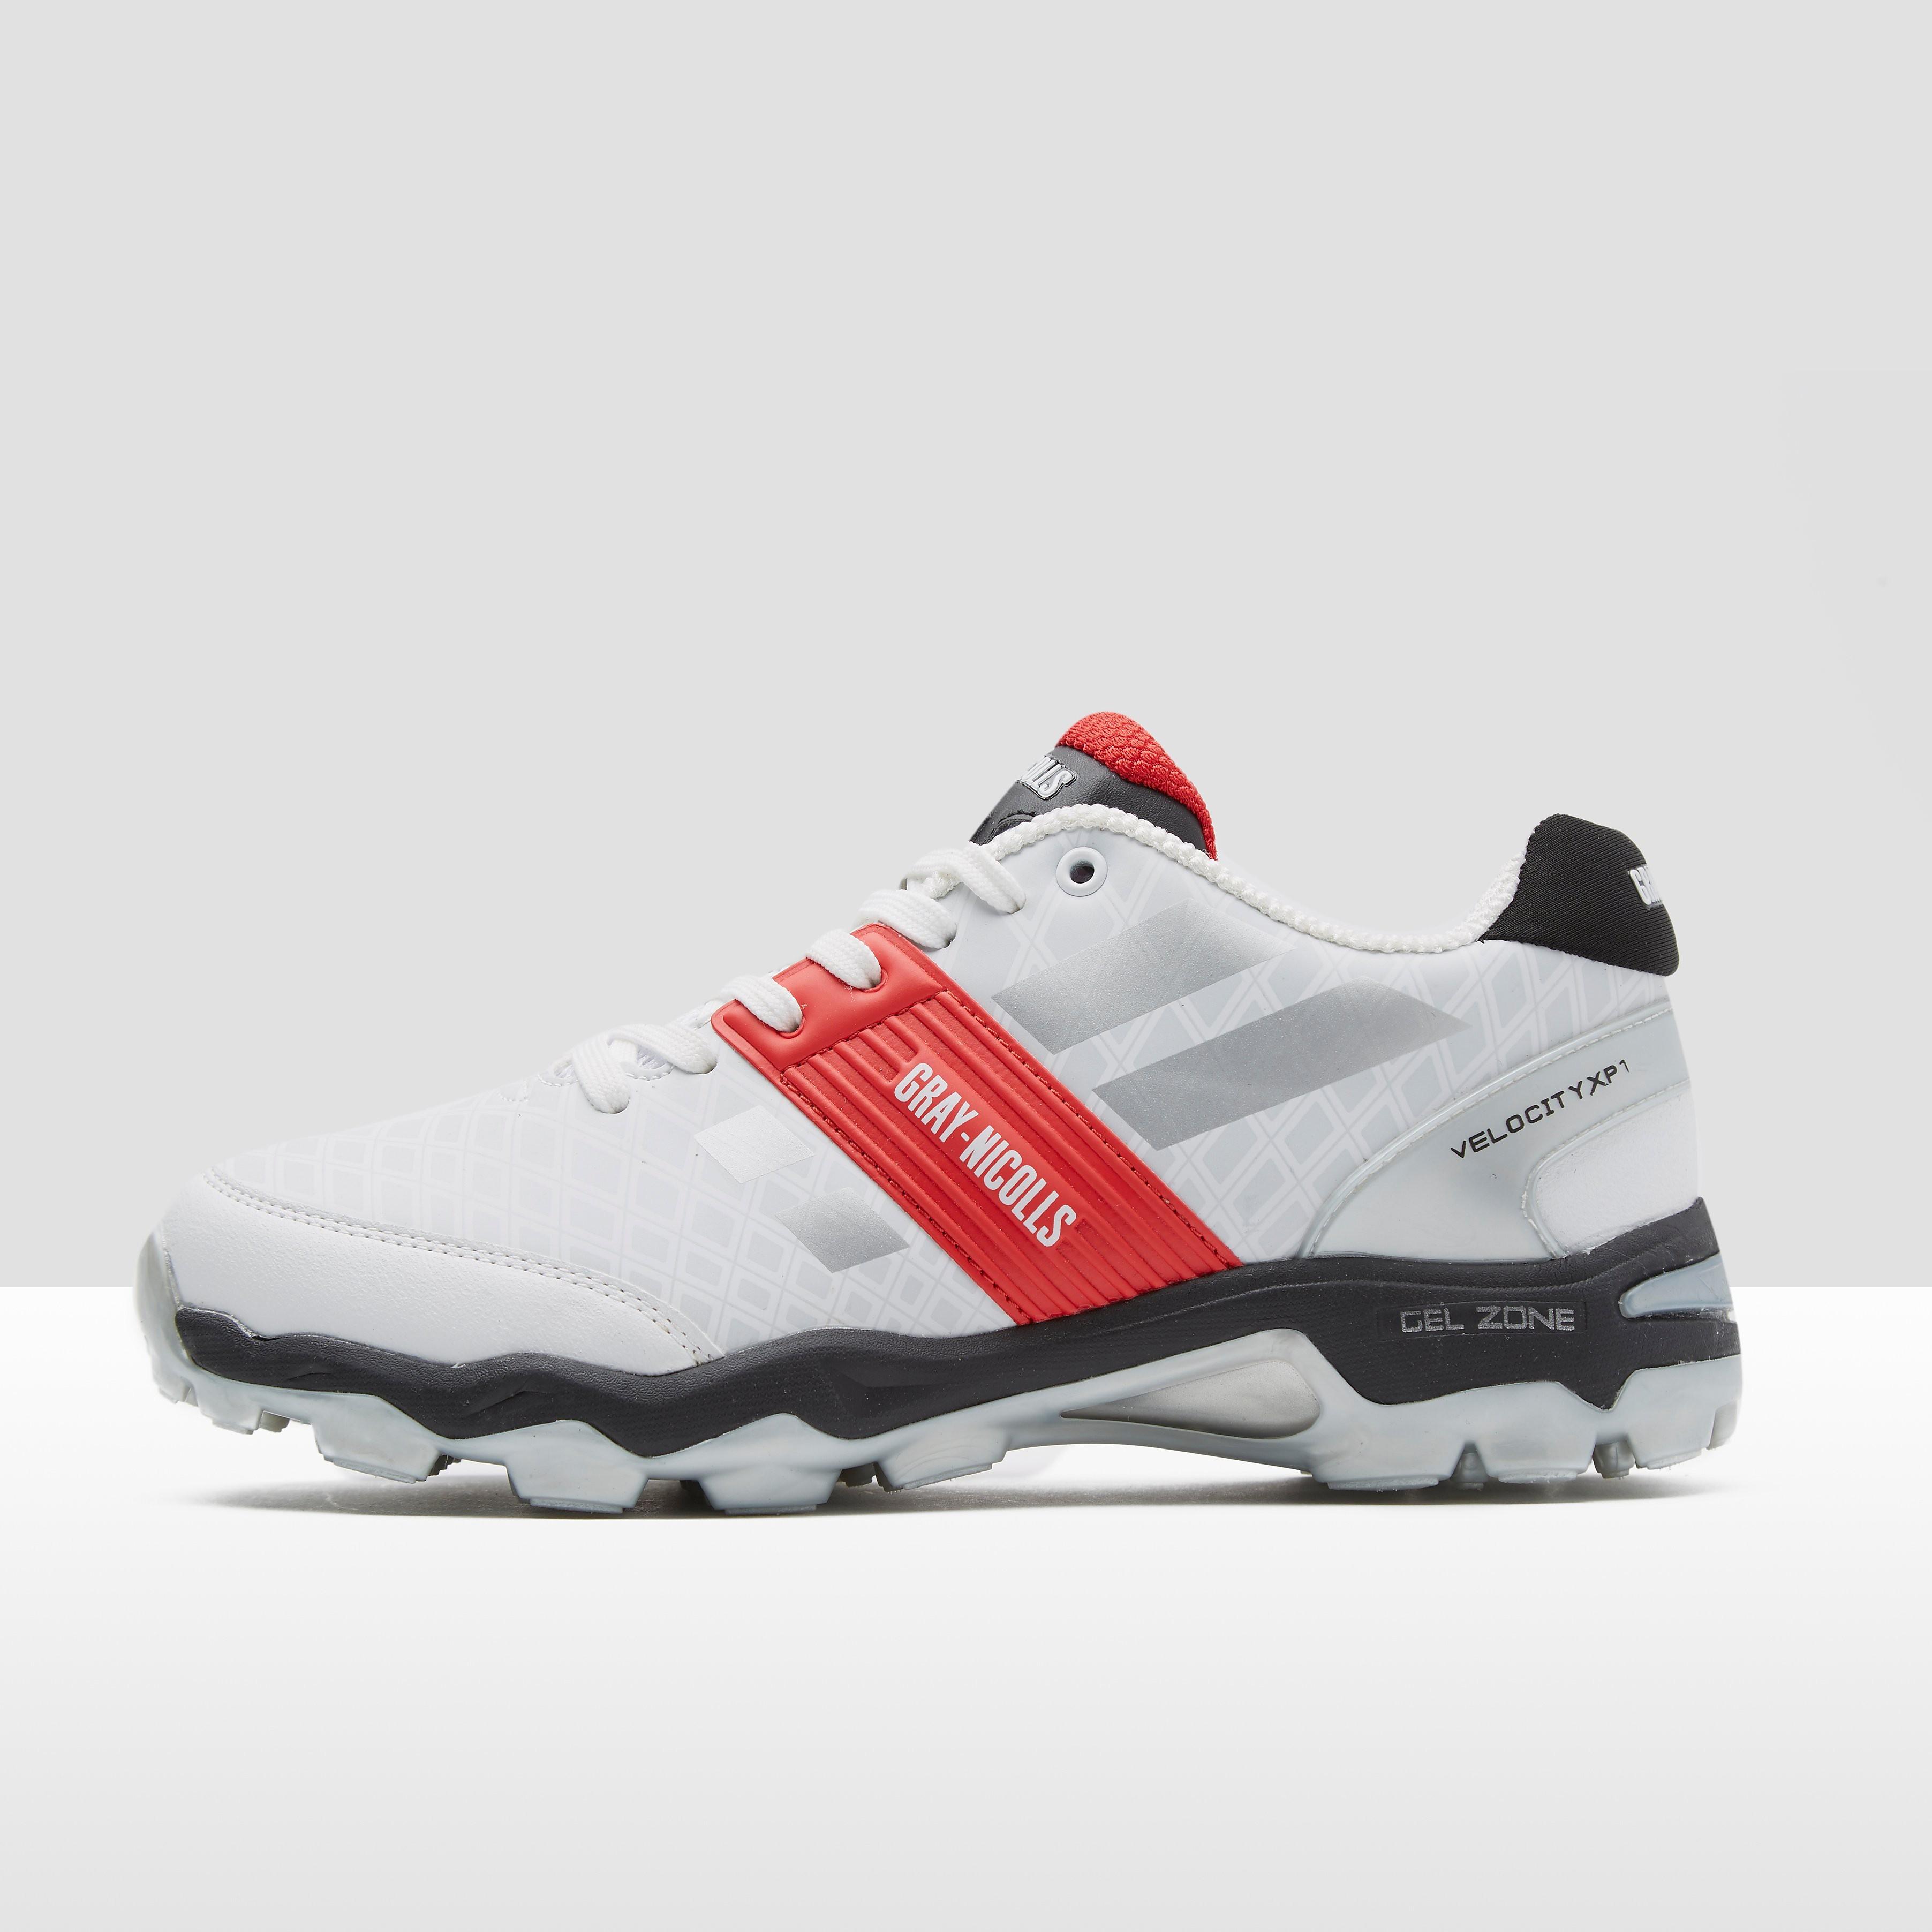 Gray-Nicolls VELOCITY XP1 Men's Cricket shoes